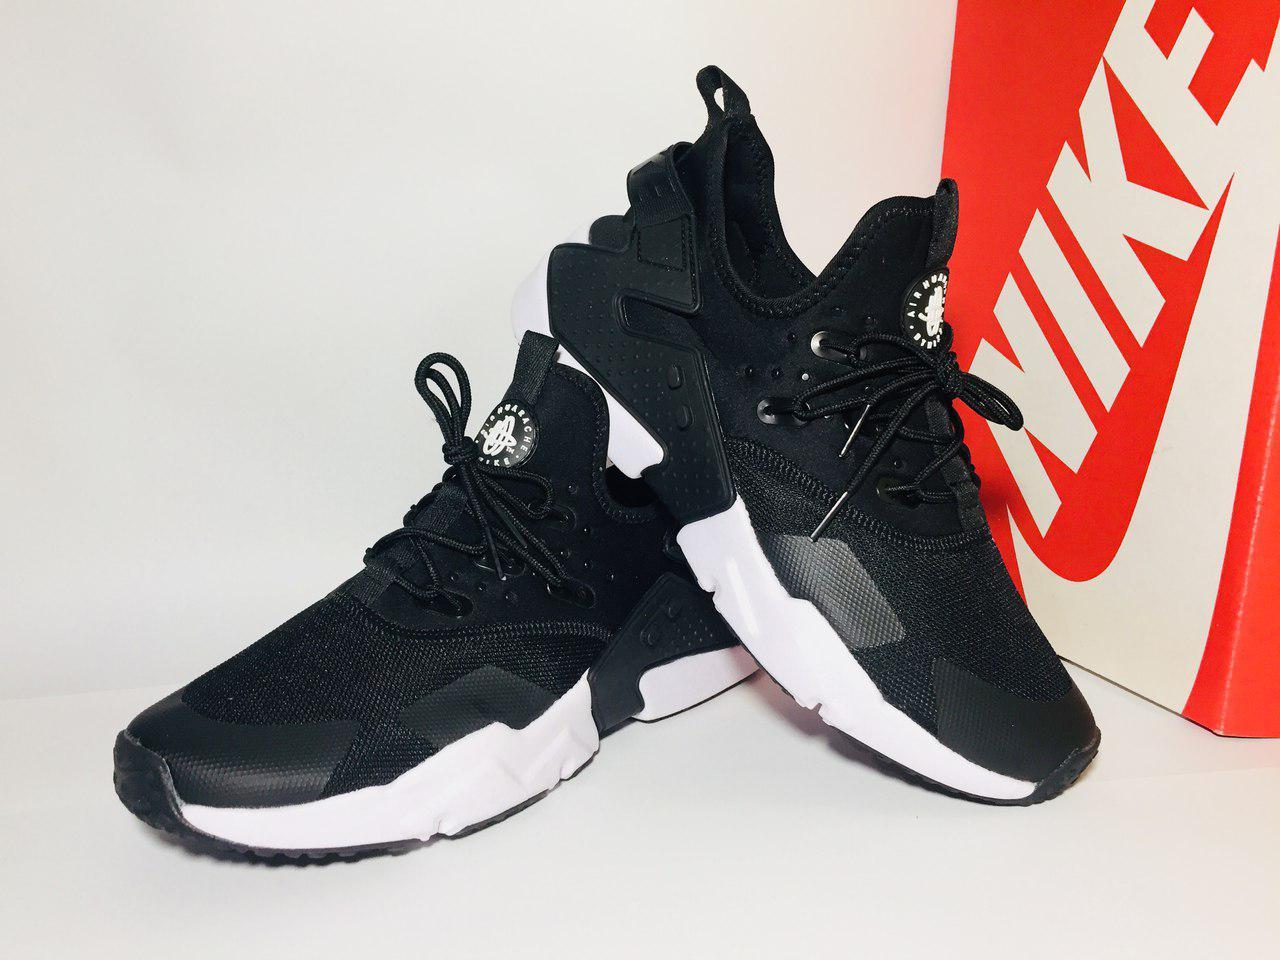 030277a8 Мужские кроссовки Nike Air Huarache Black 2018(ТОП РЕПЛИКА ААА+): ...